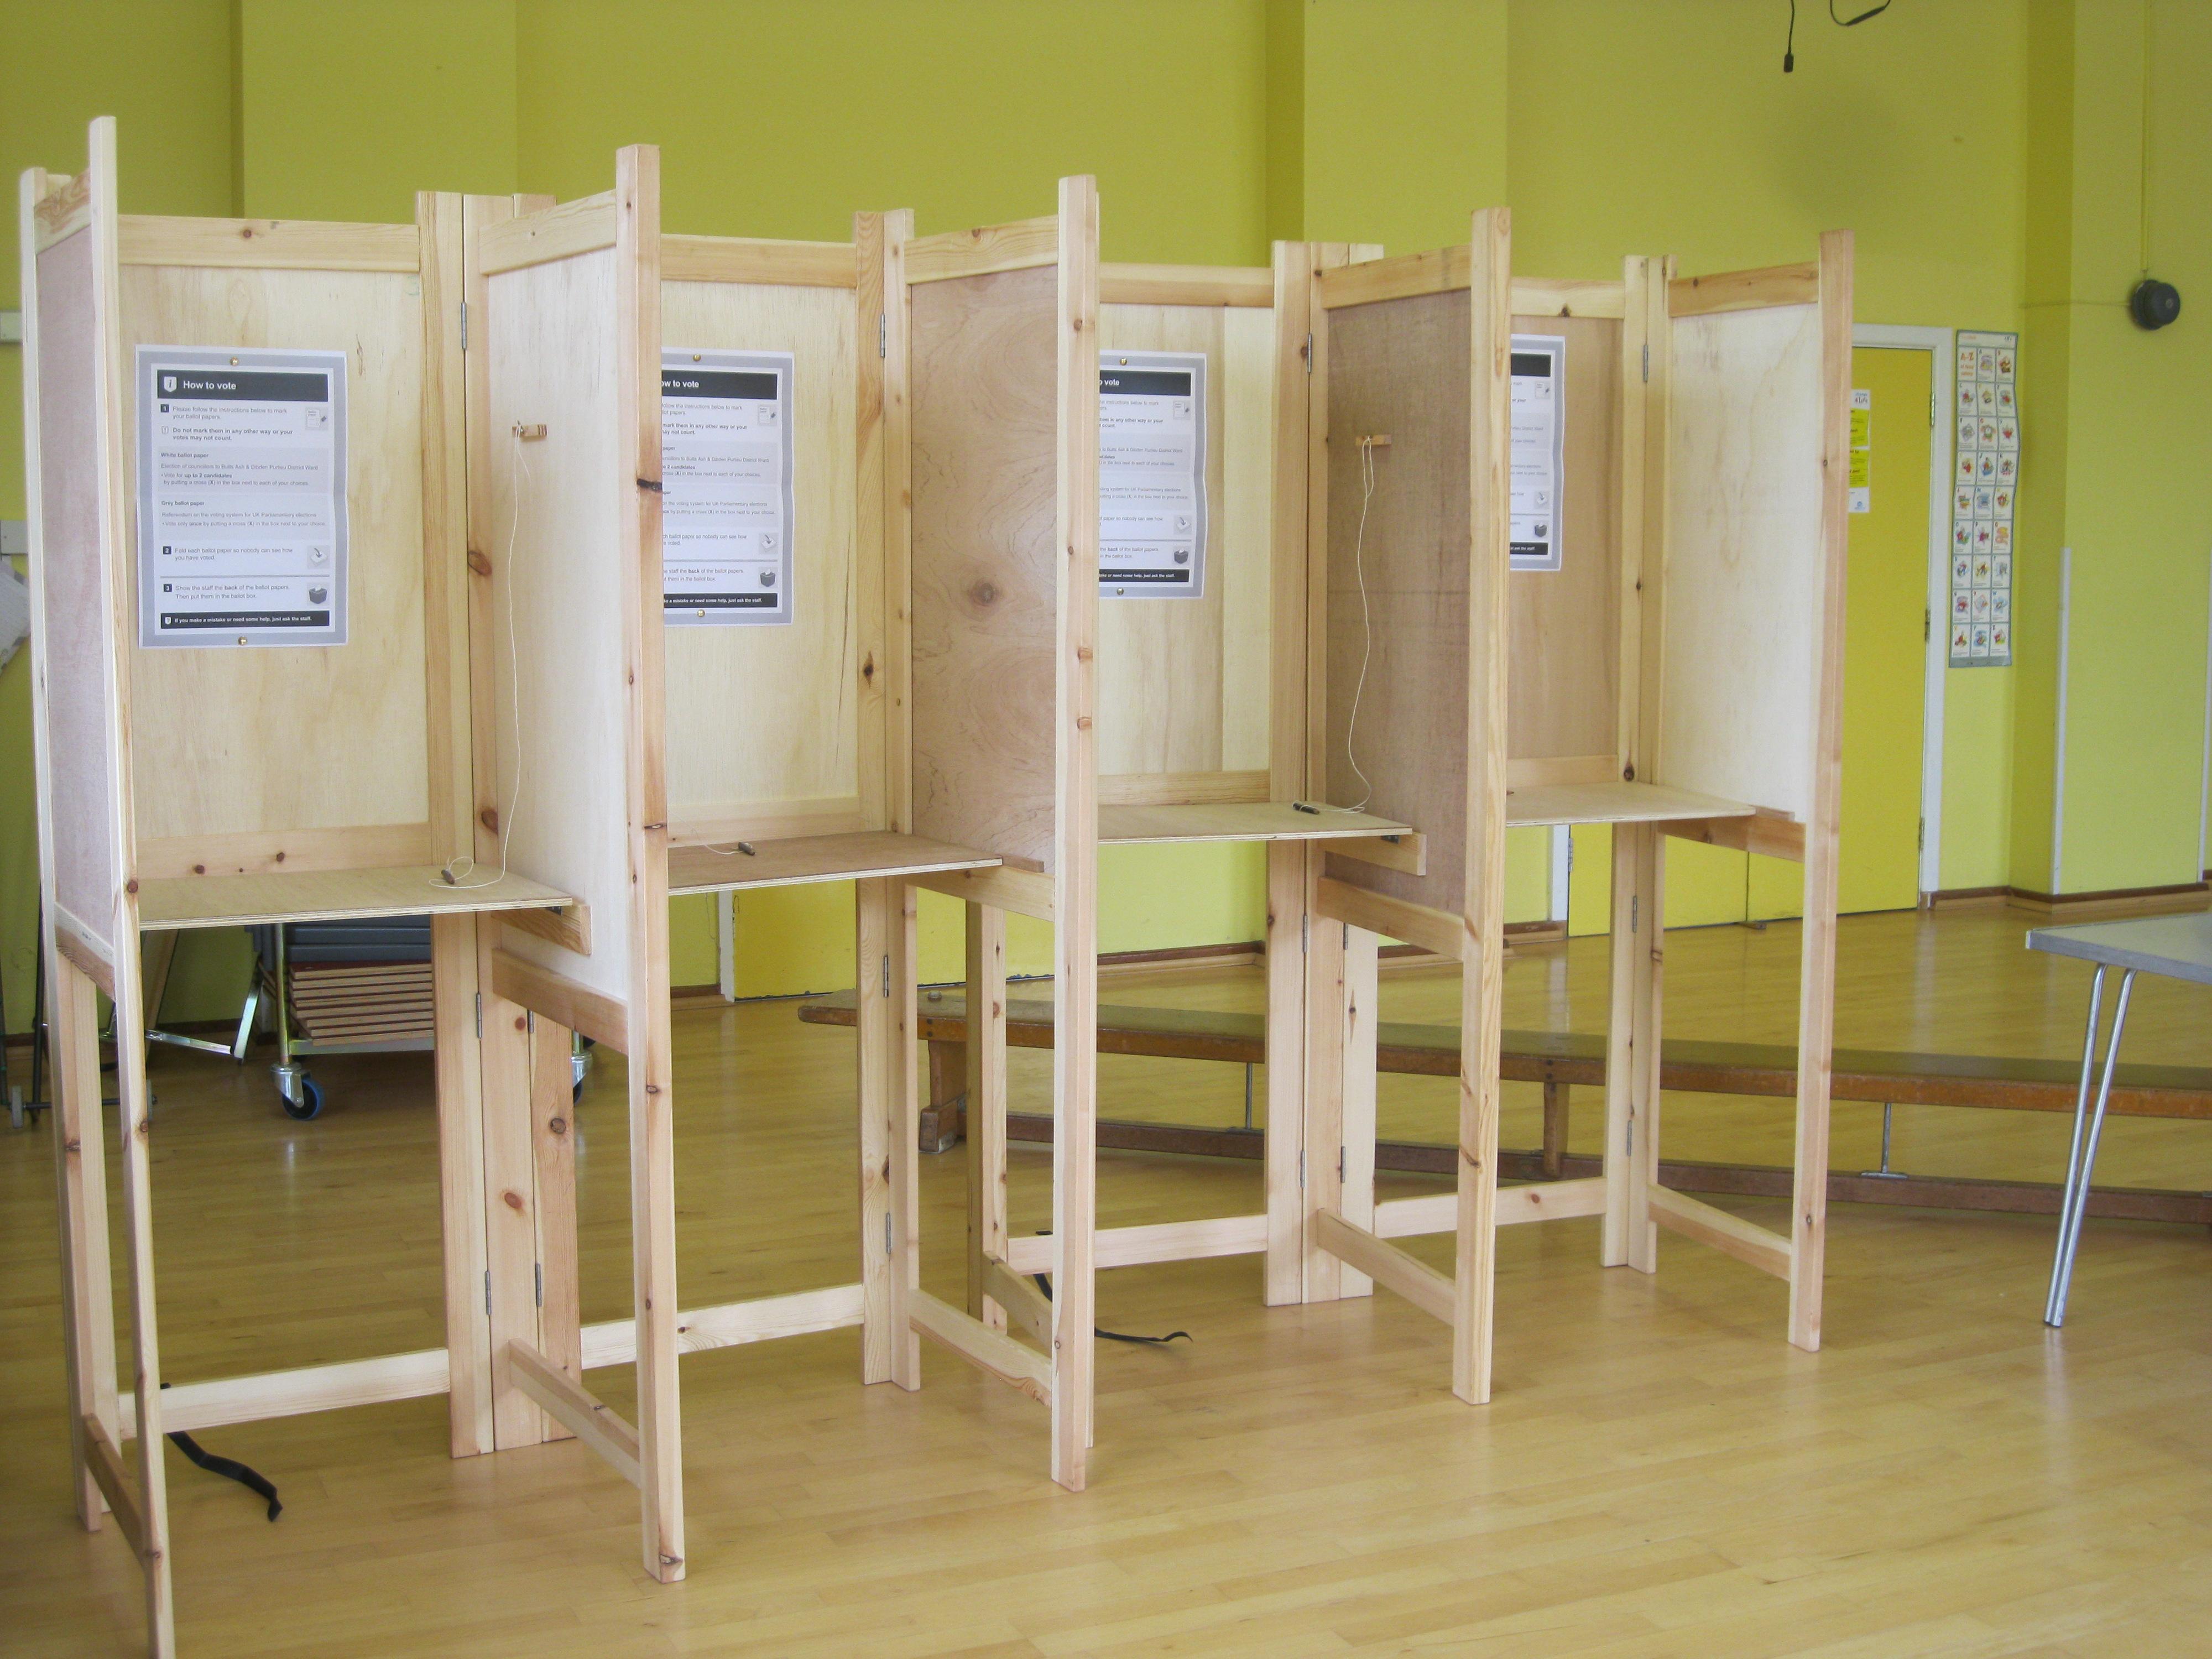 UK Polling Booth 2011 JPG